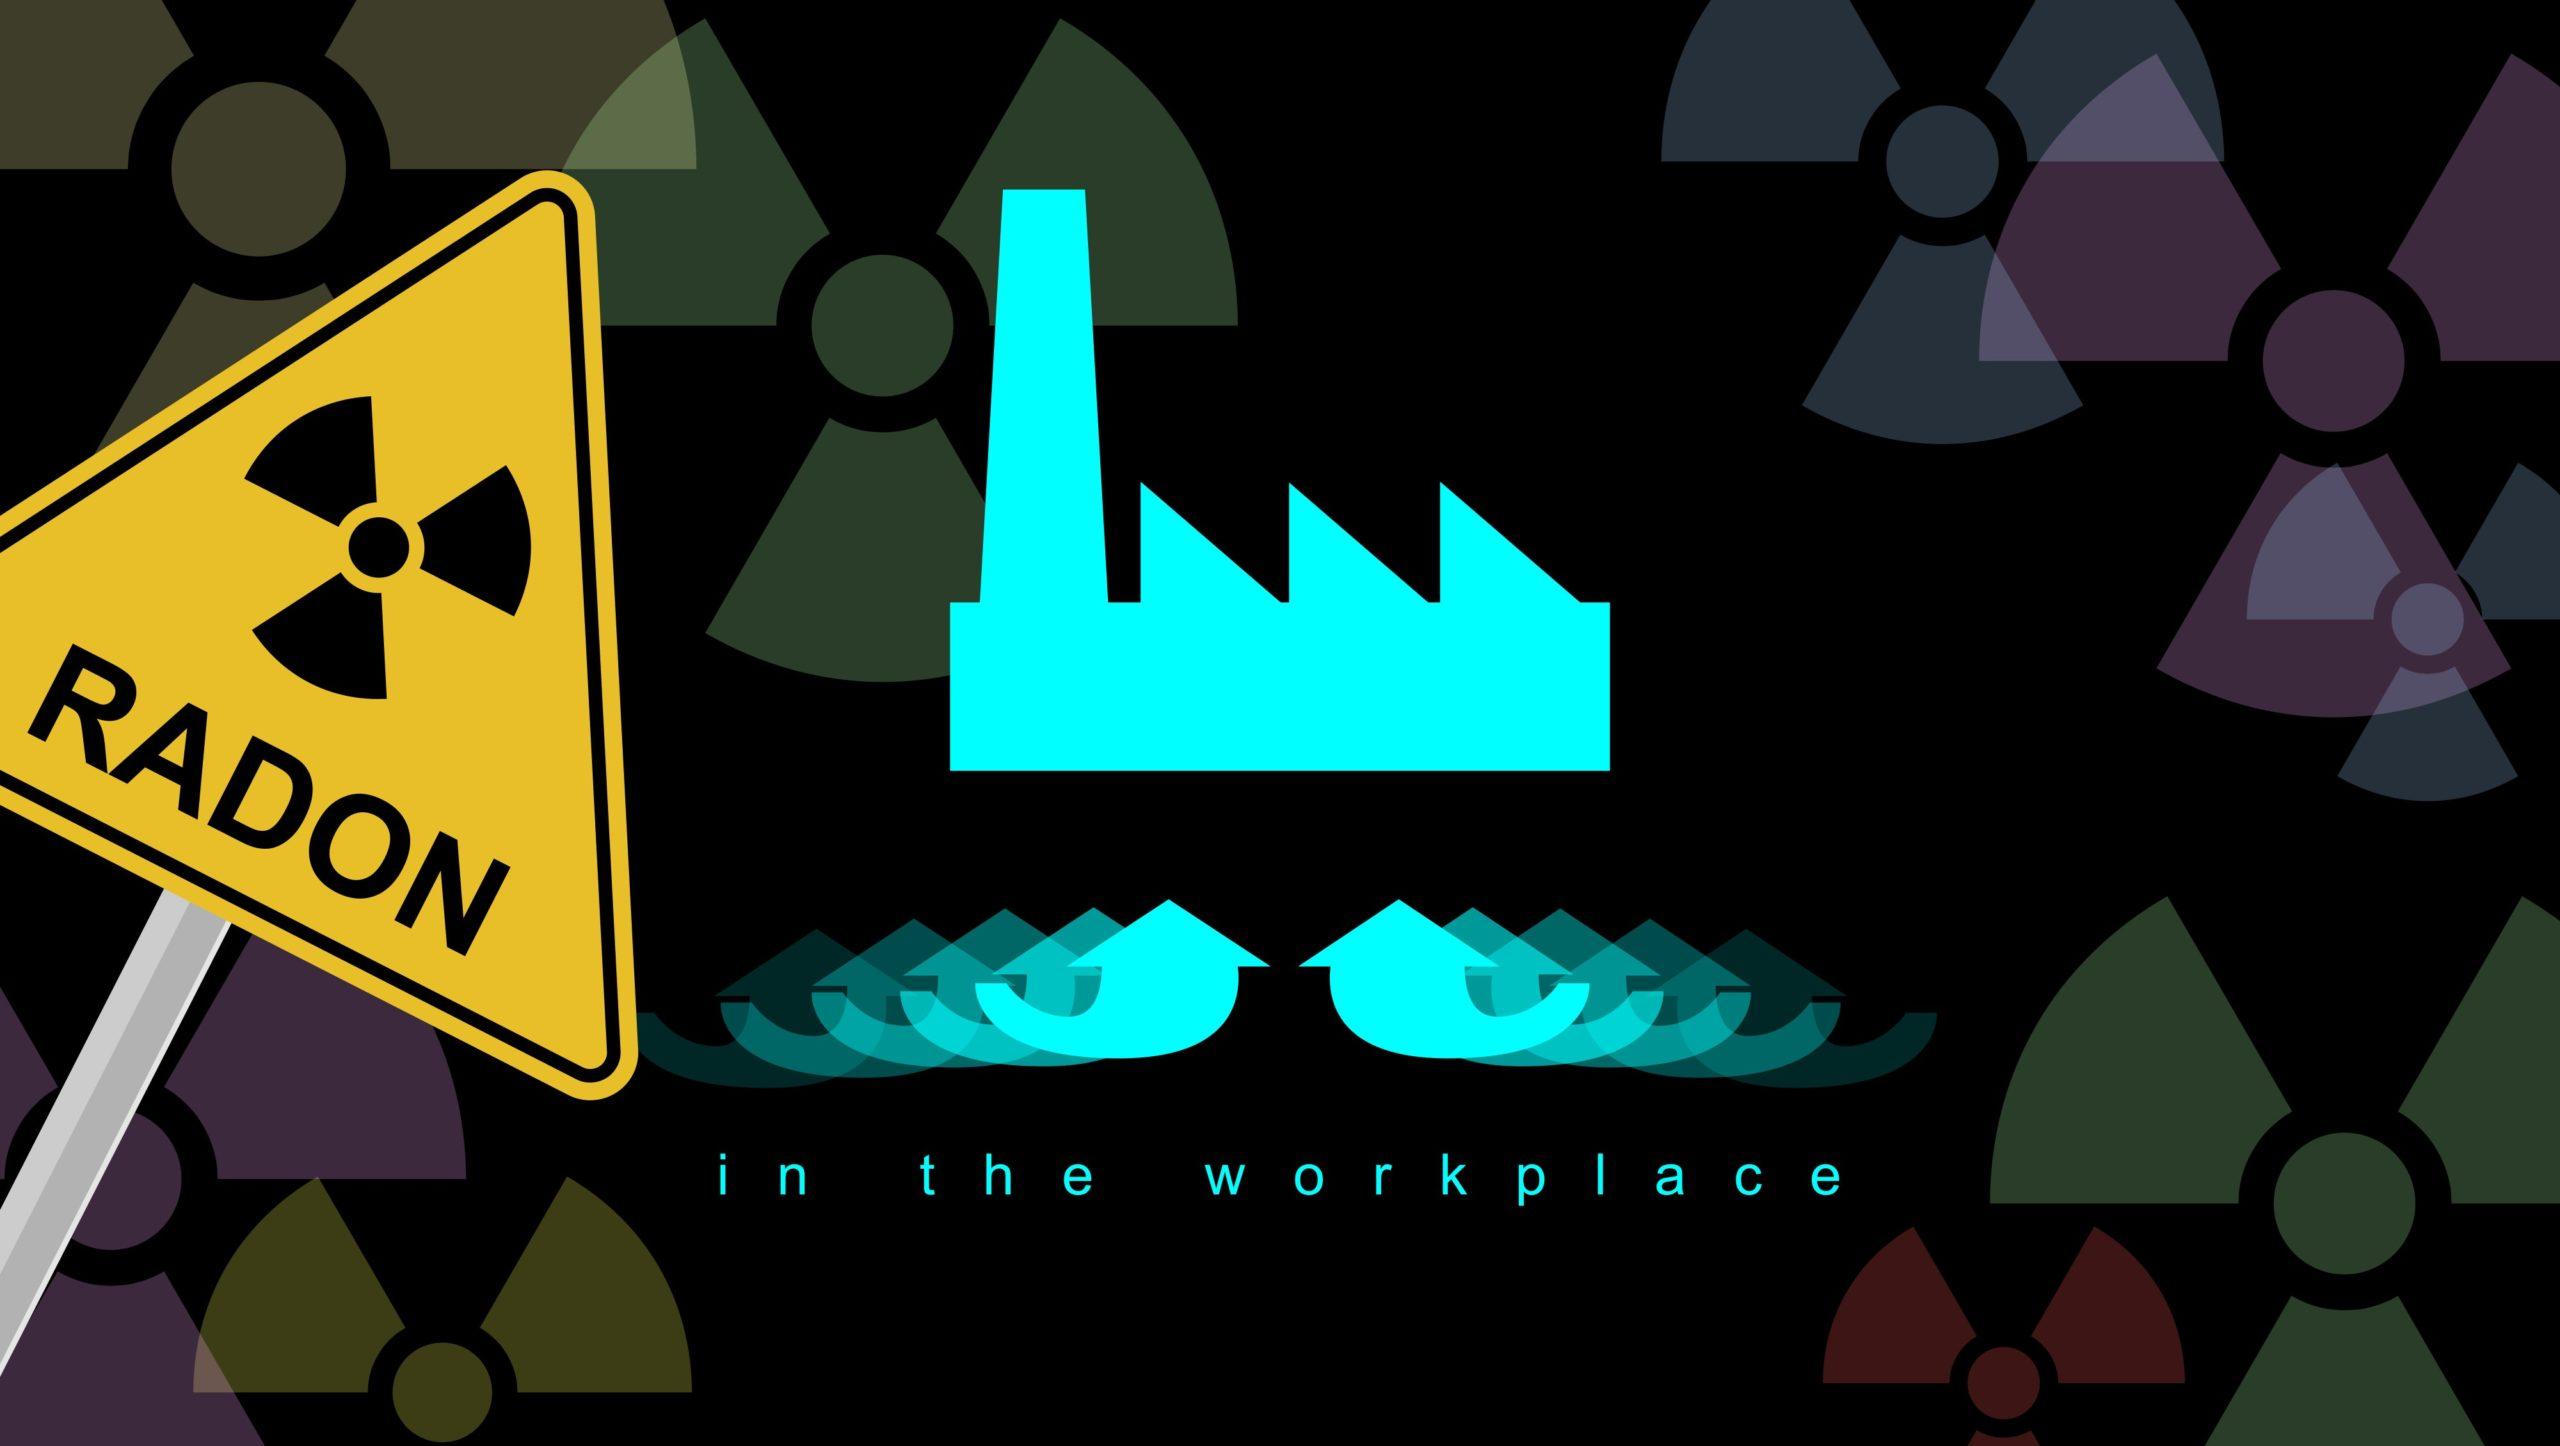 radon-workplace